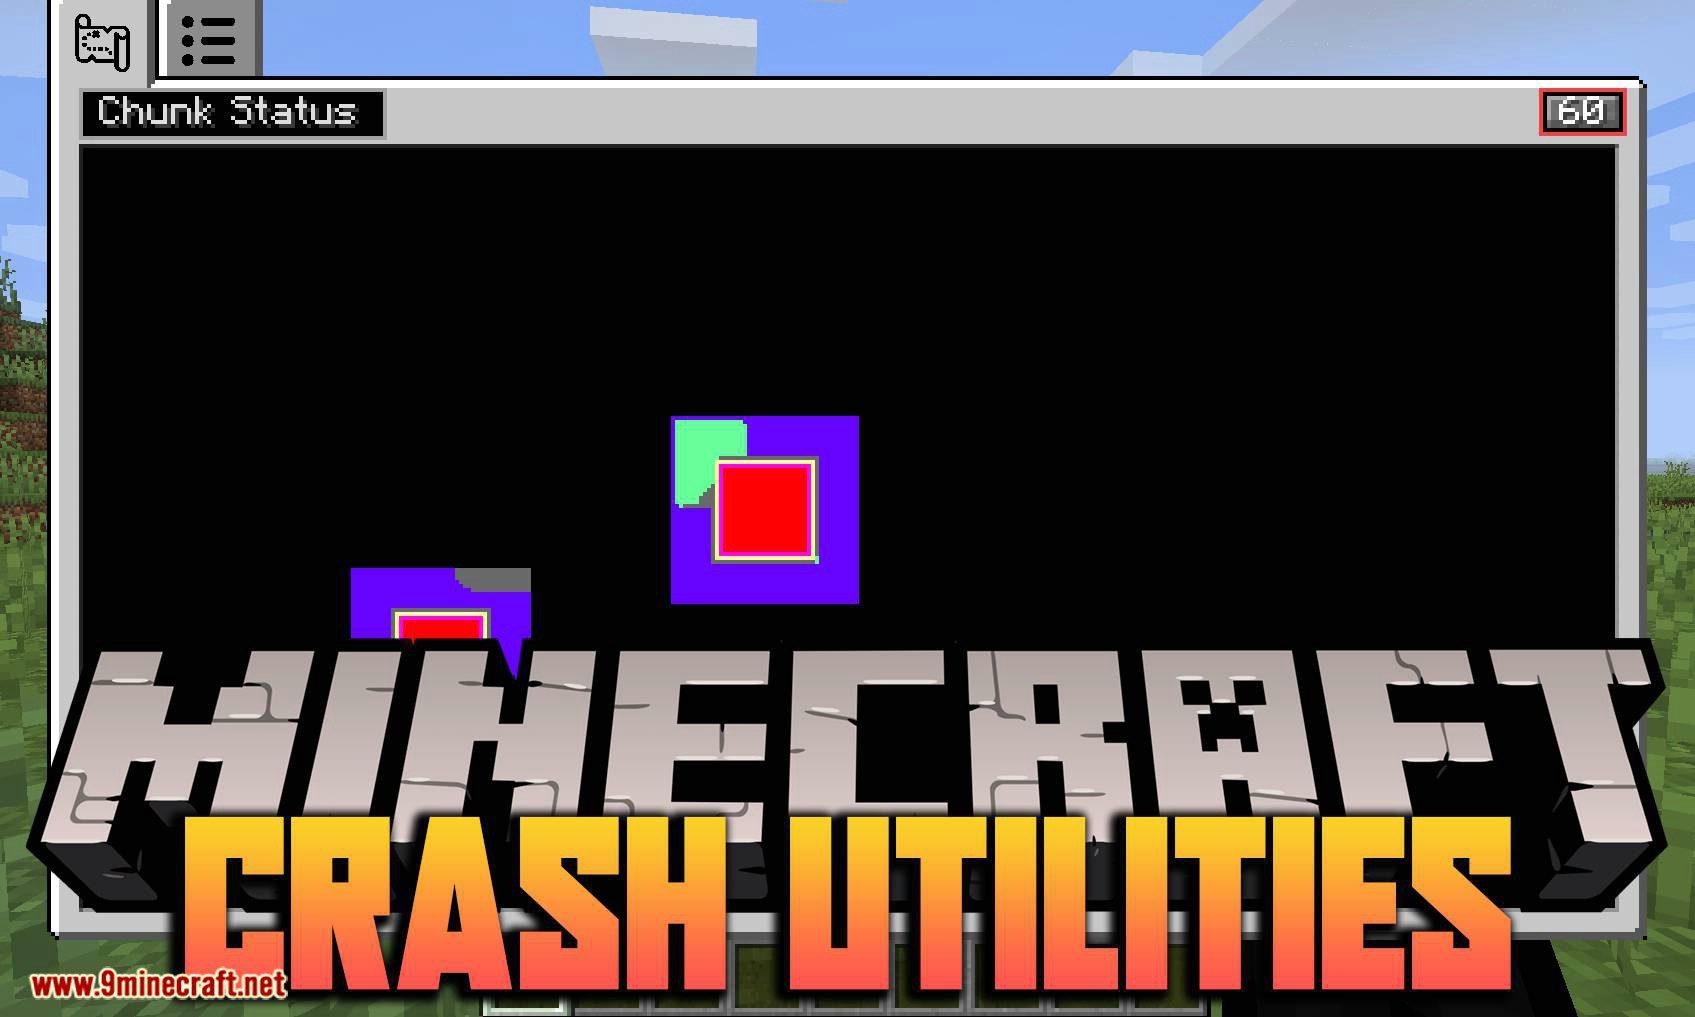 Crash Utilities Mod 8.86.8/8.85.8 (Utilities for Server Admins